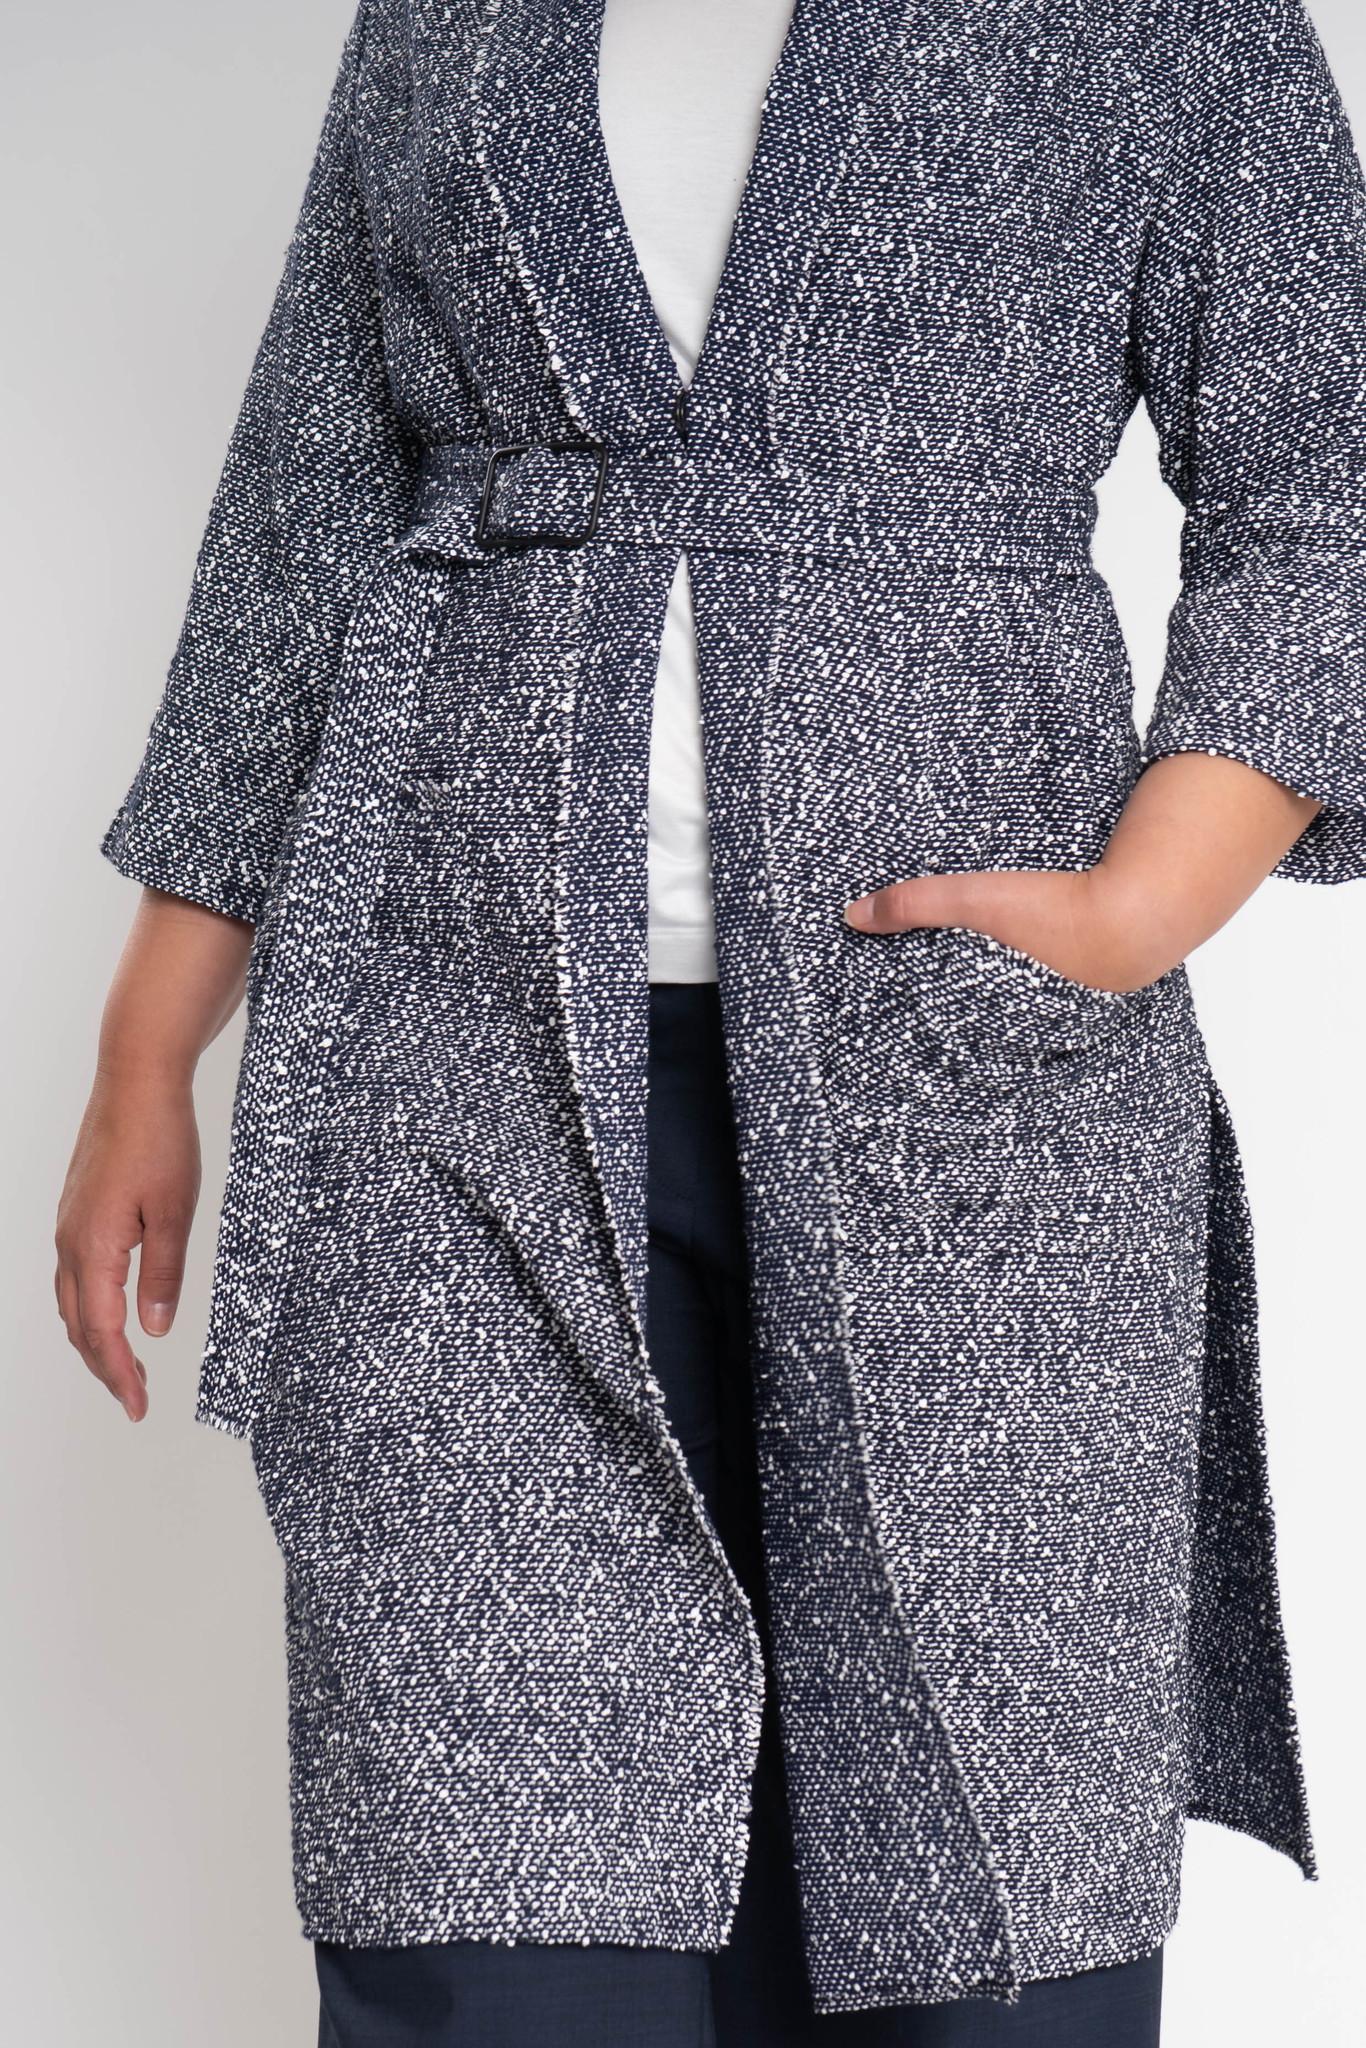 KARINA Jacket in fine Cotton-Bouclé-4